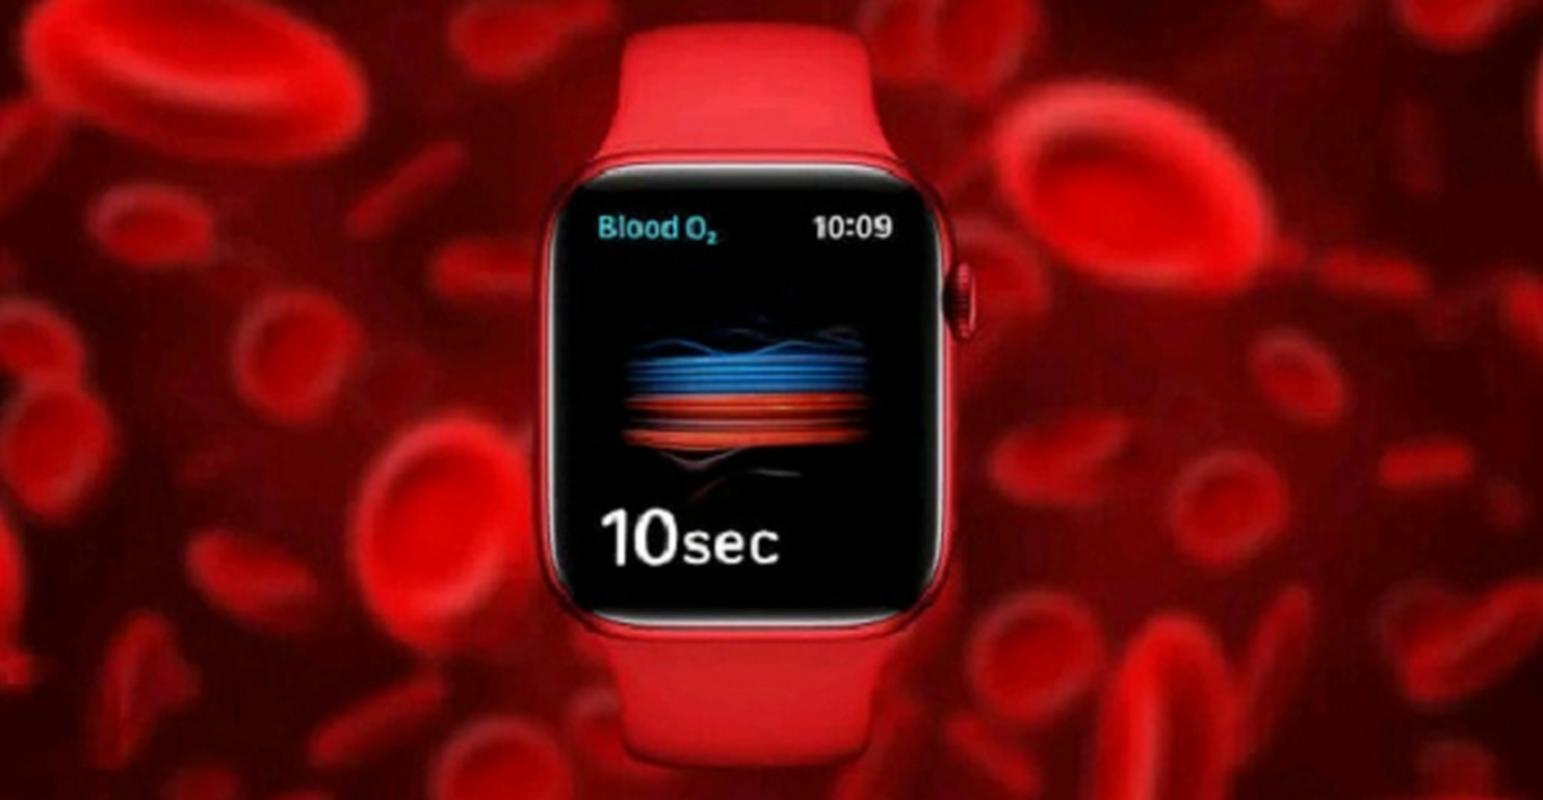 Apple Watch do duoc nong do con va duong huyet trong tuong lai?-Hinh-5